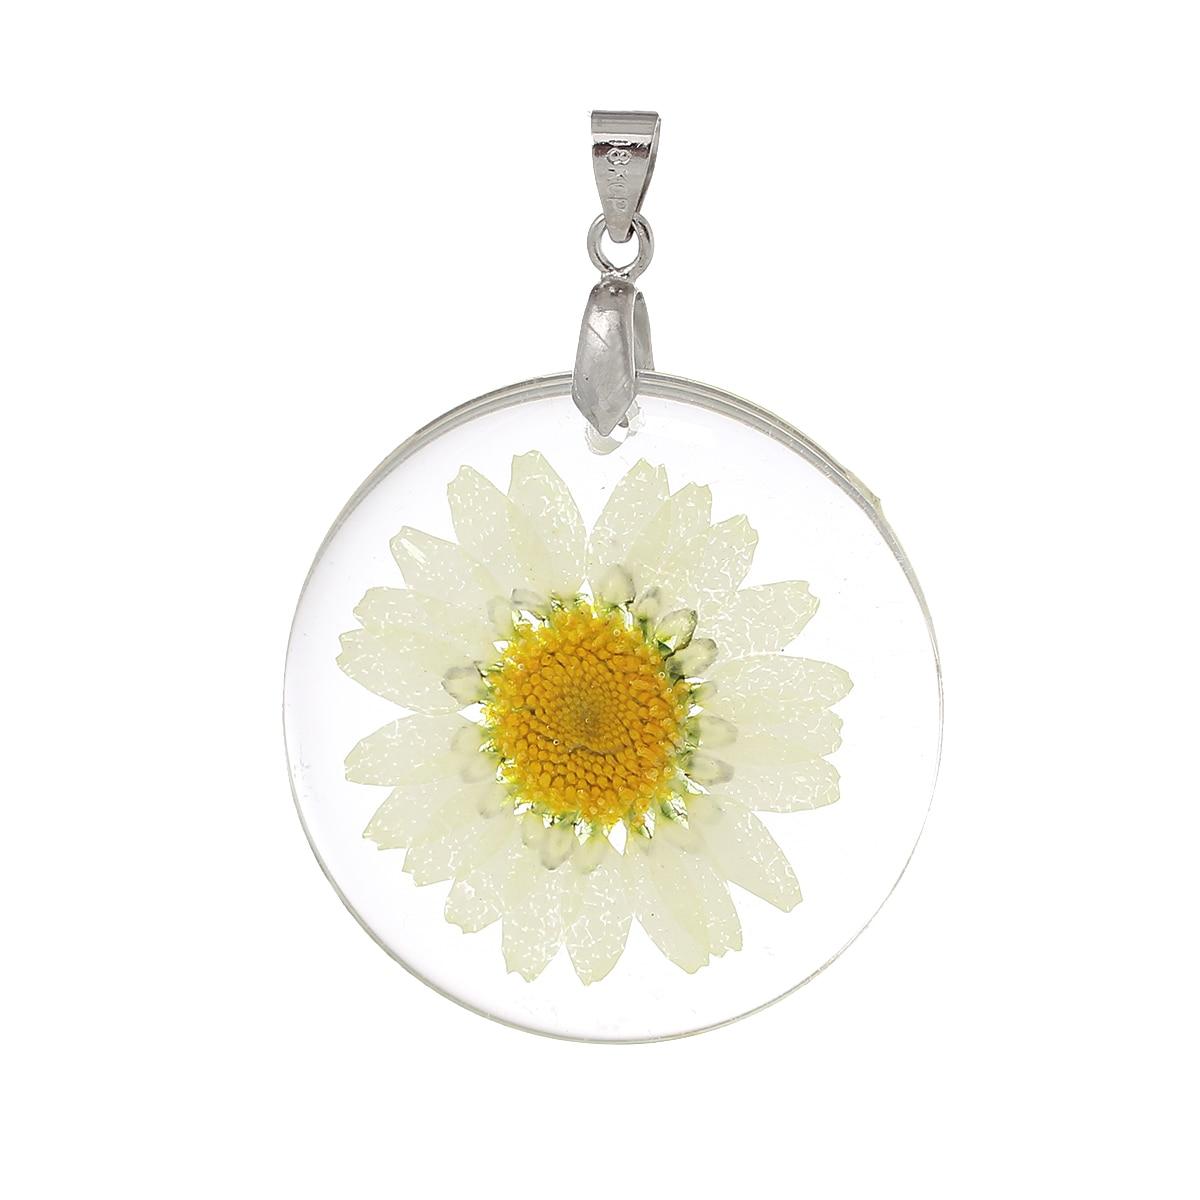 "DoreenBeads Μενταγιόν γοητείας ρητίνης Γύρος διαφανές κίτρινο πραγματικό λουλούδι 44 mm (1 6/8 "") x 32 mm (1 2/8""), 3 υπολογιστές"